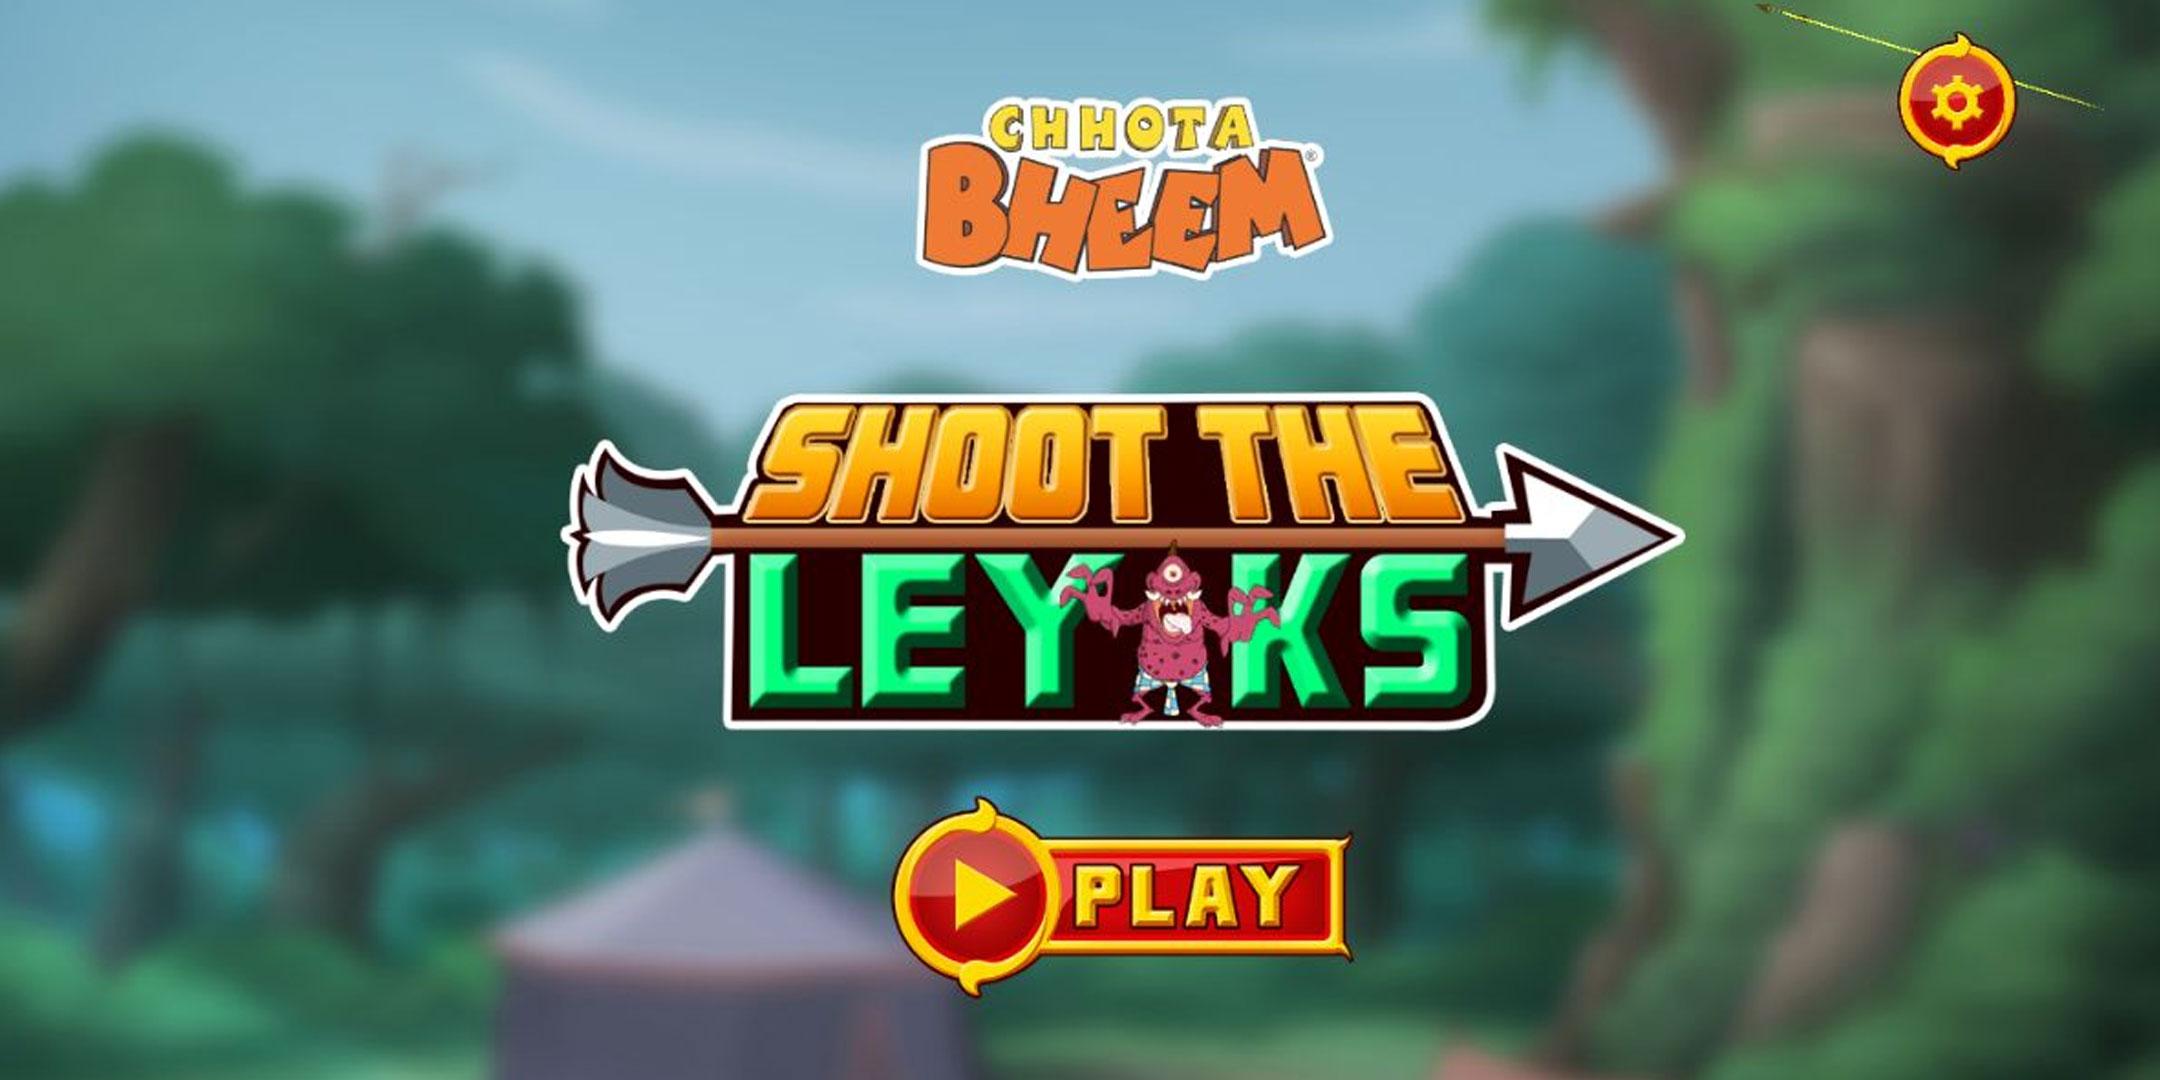 Free Download Install Chhota Bheem Shoot The Leyaks Game App